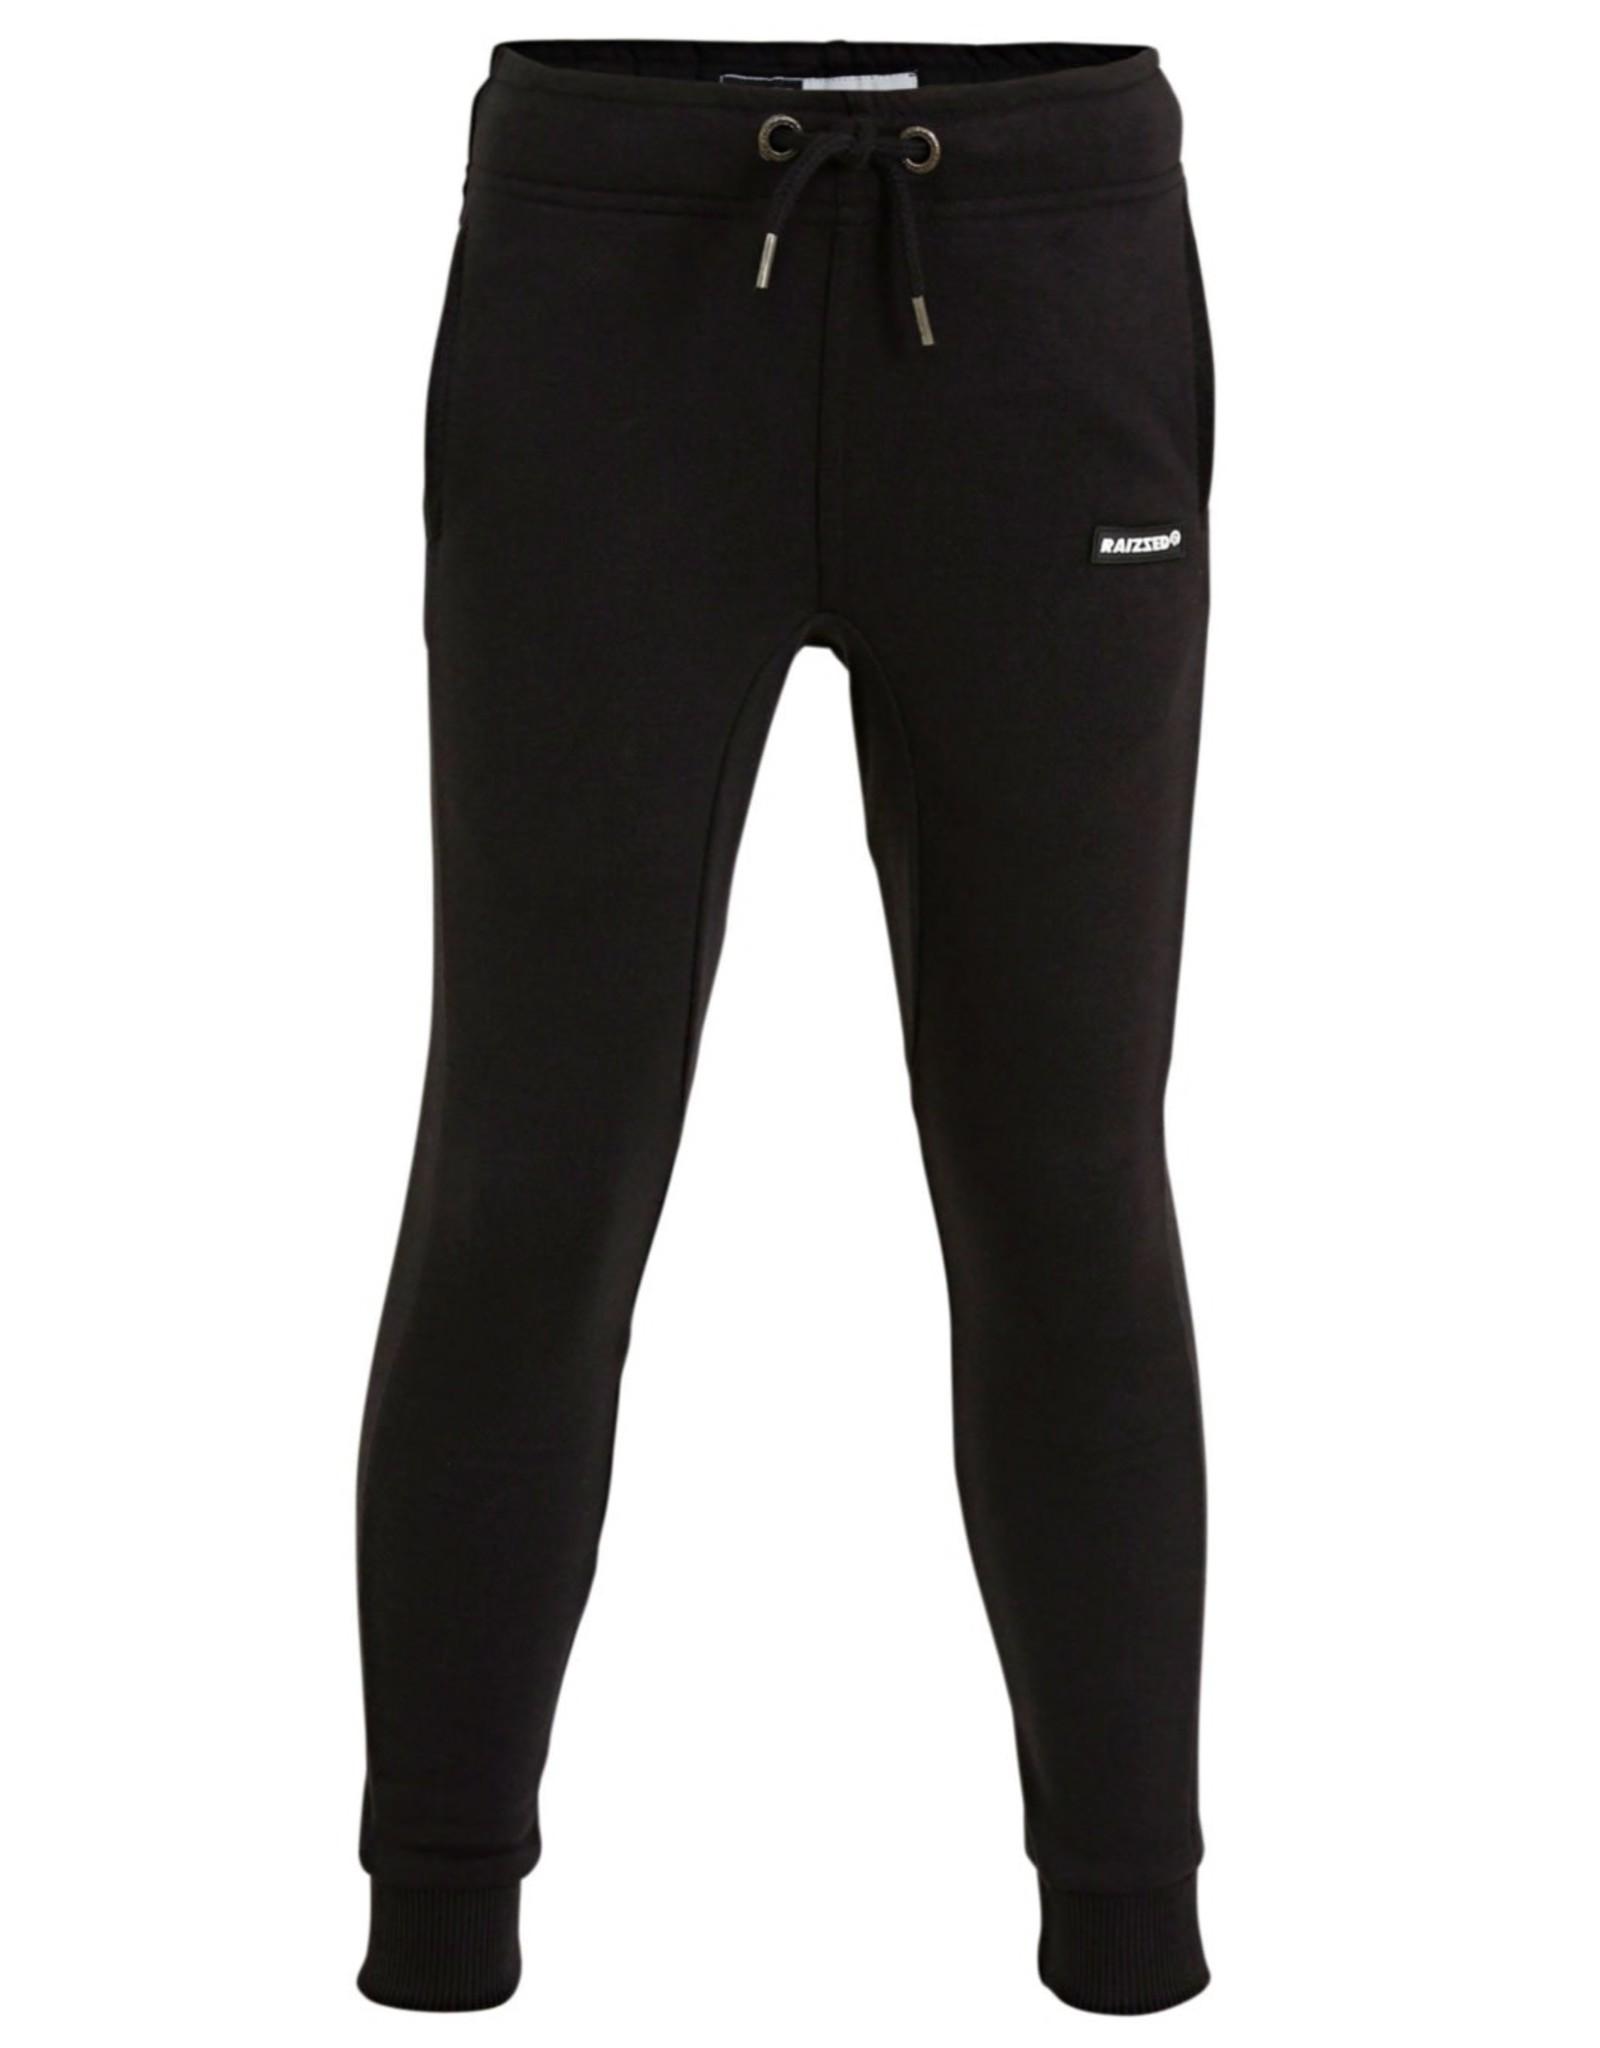 Raizzed Sanford Sweatpants